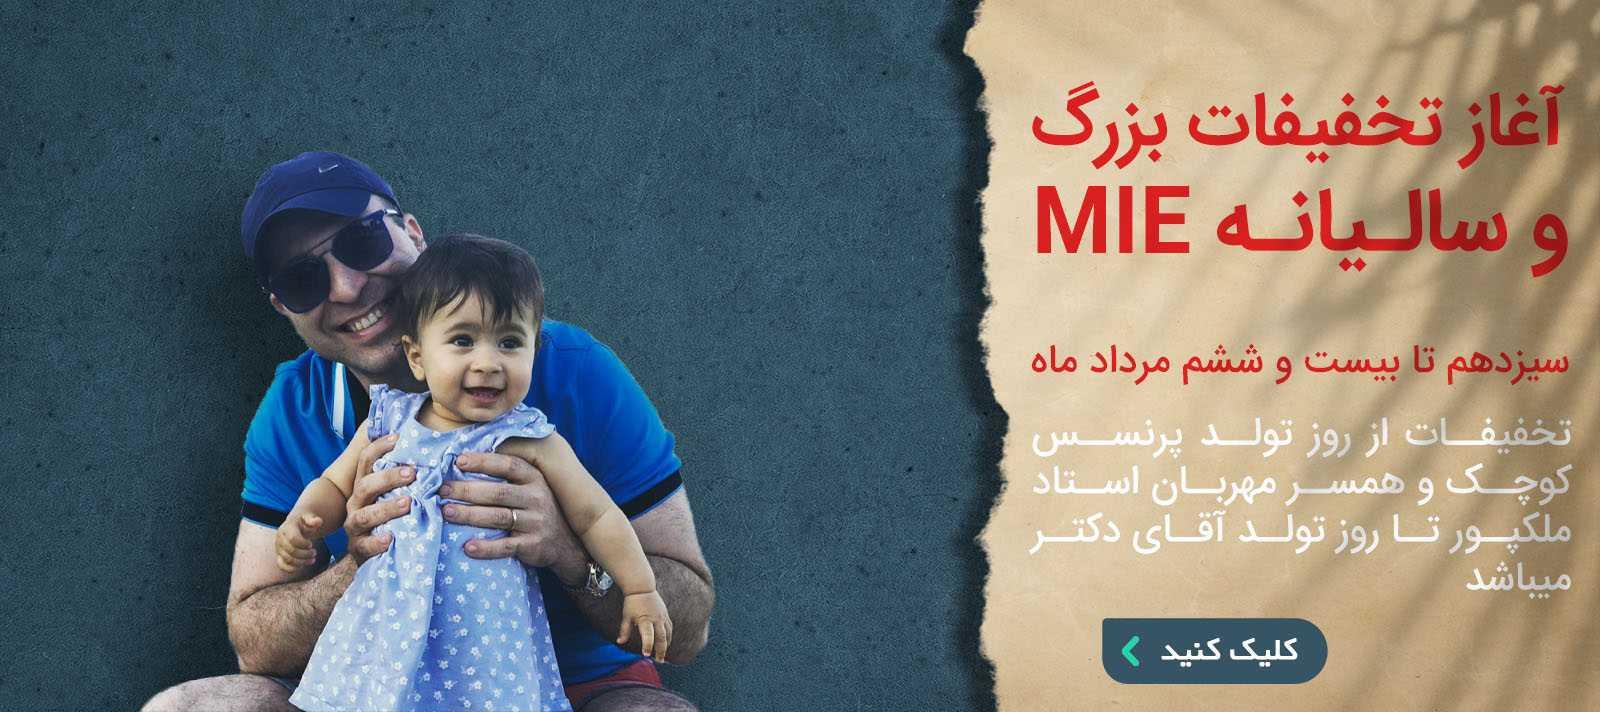 malekpourmie offer banner 2 صفحه اصلی موسسه حقوقی ملکپور